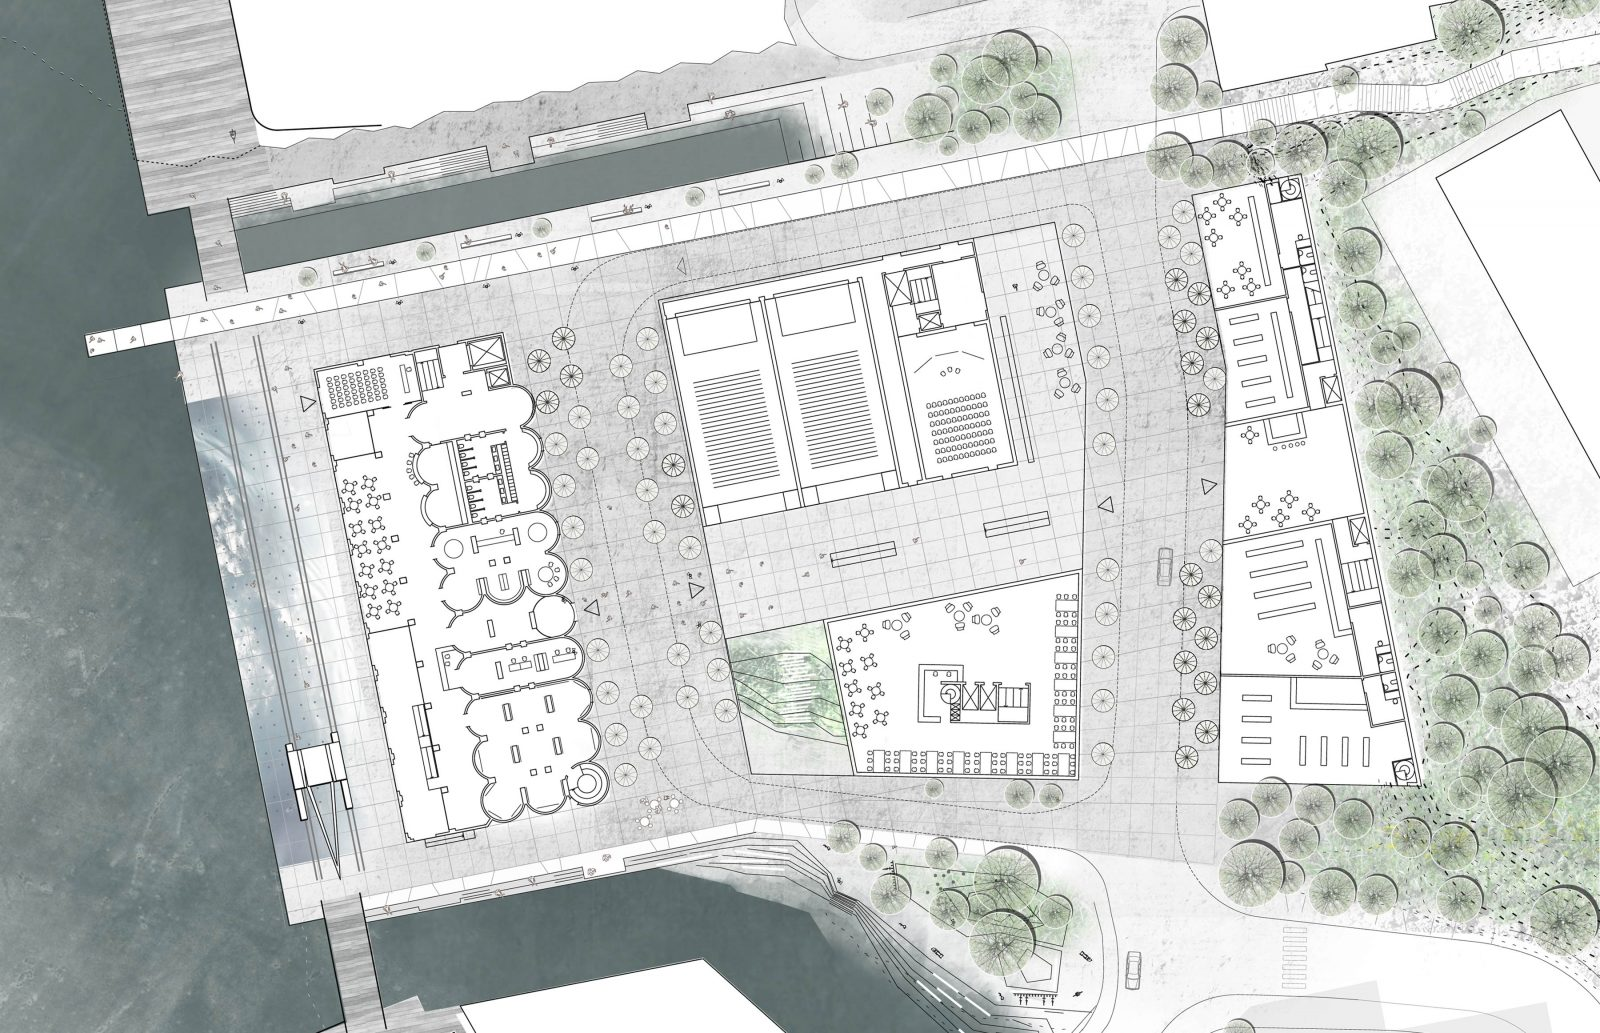 Kristiansand Floor-plan zoom-in